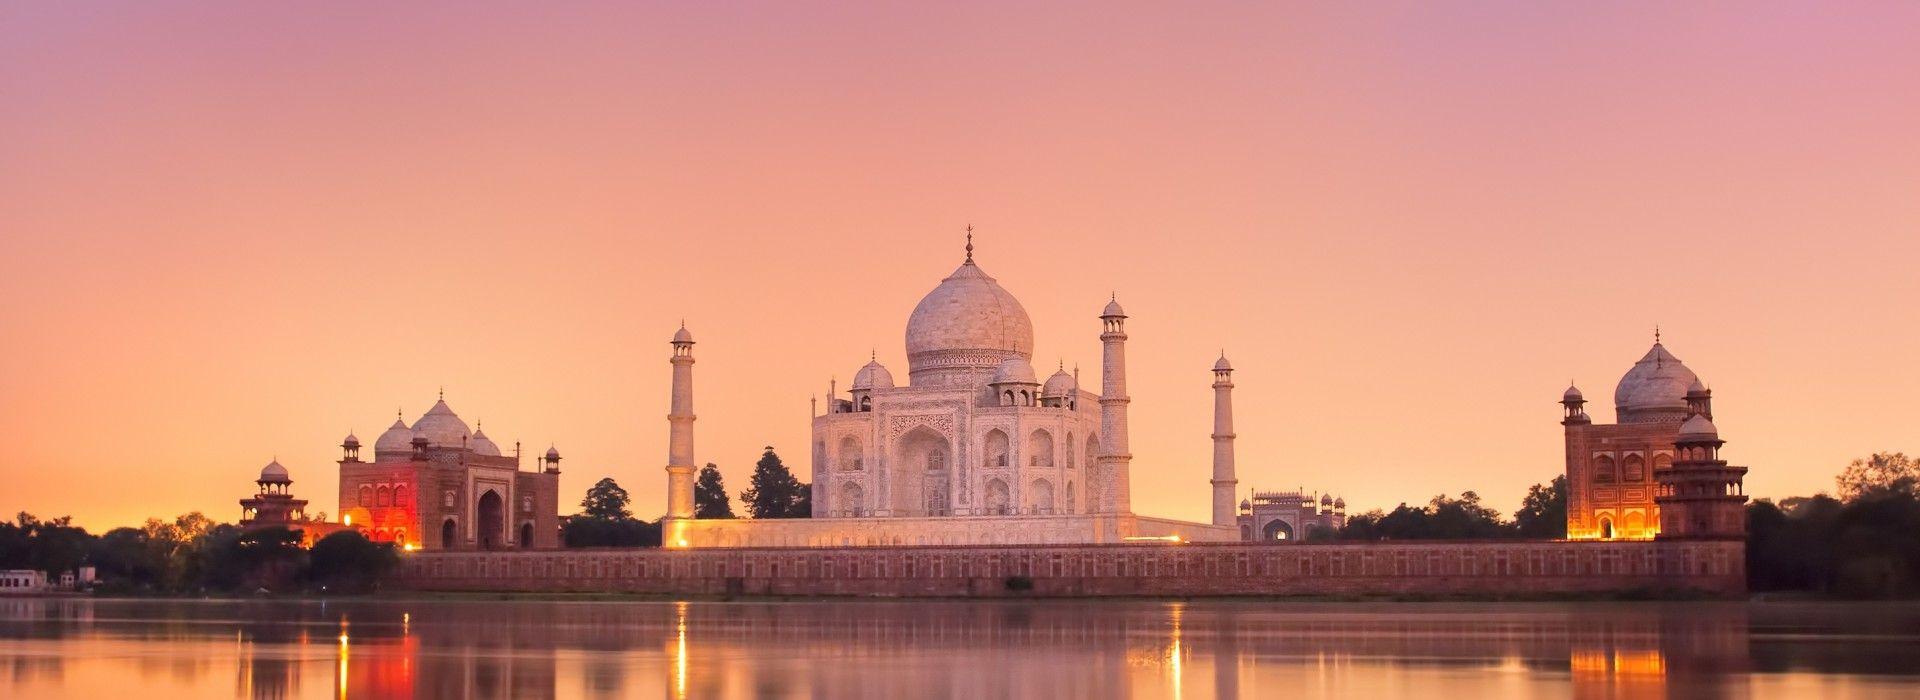 City sightseeing Tours in Mumbai